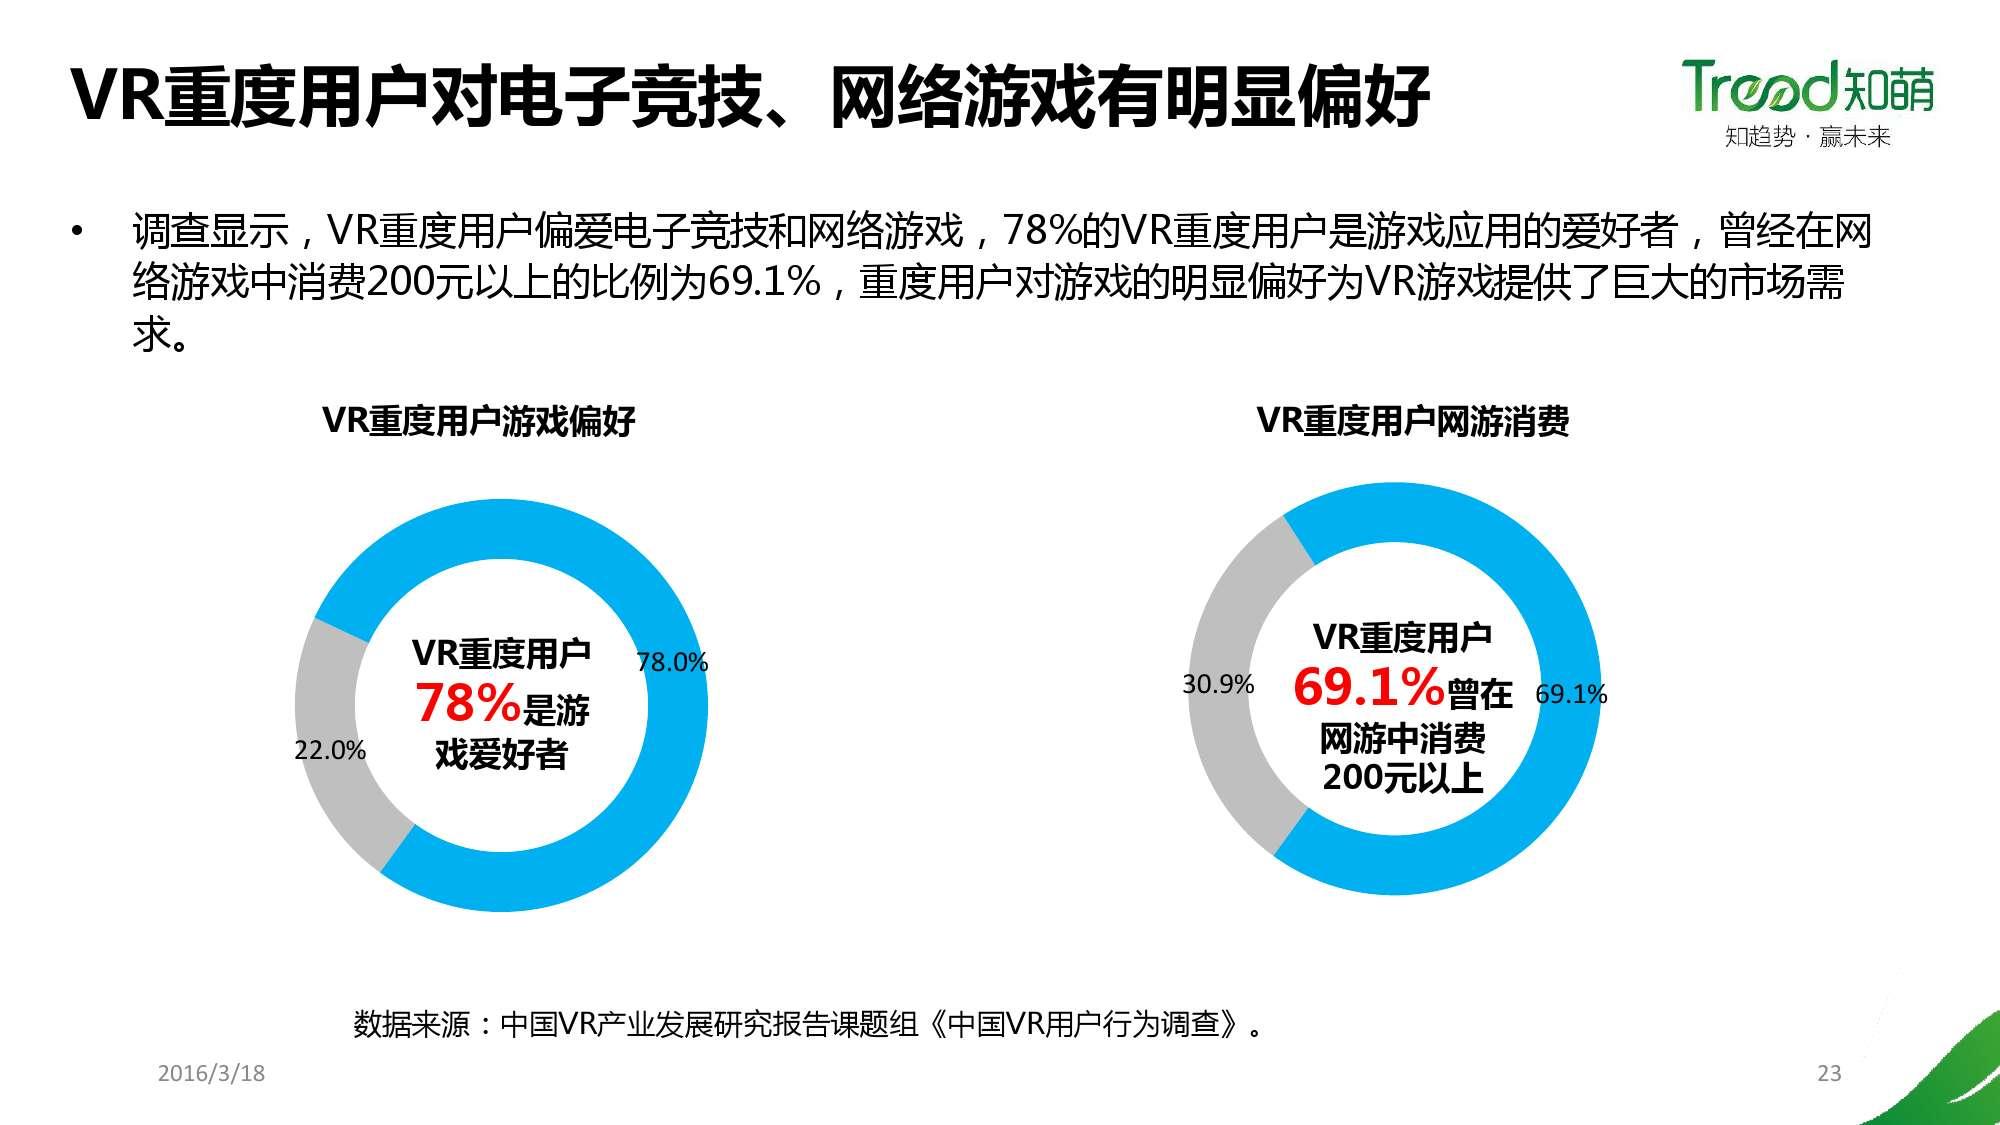 【PPT】《2016年中国VR用户行为研究报告》